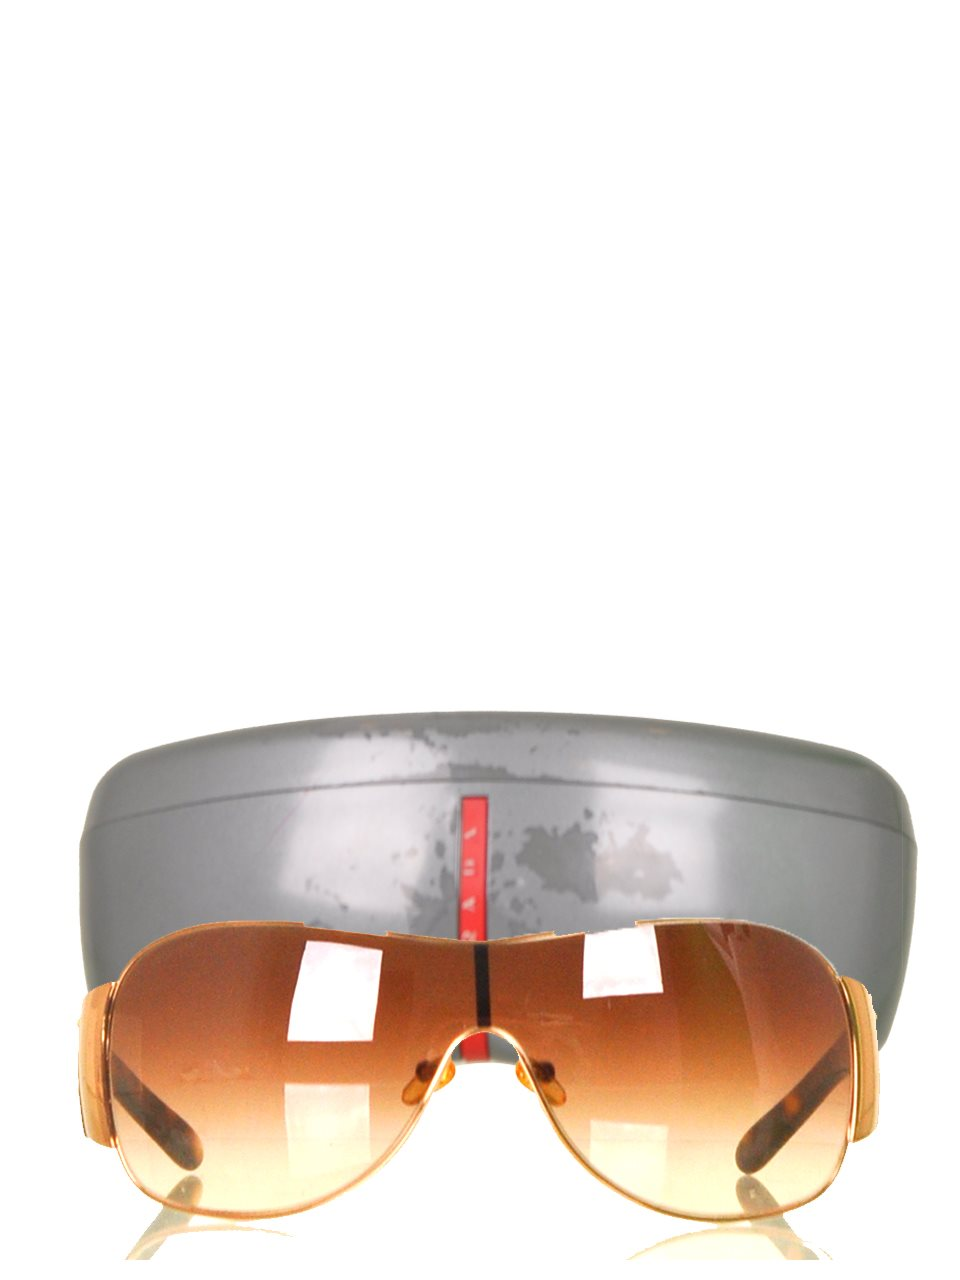 Prada - Sunglasses - Image 3 of 5